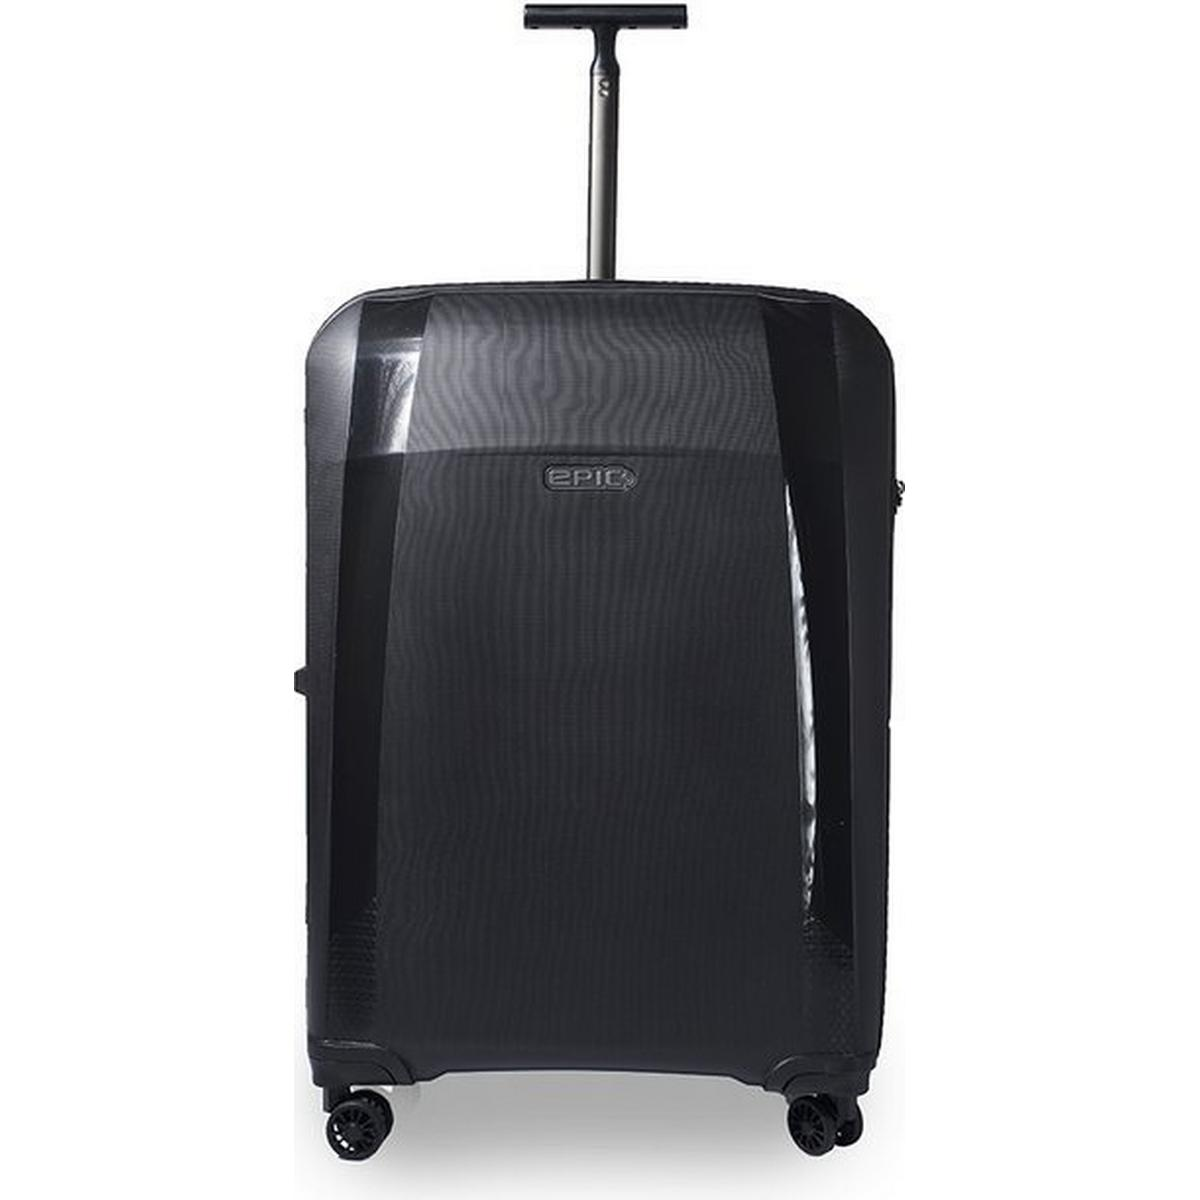 Tidsmæssigt Kuffert - Sammenlign priser på kufferter hos PriceRunner GC-55